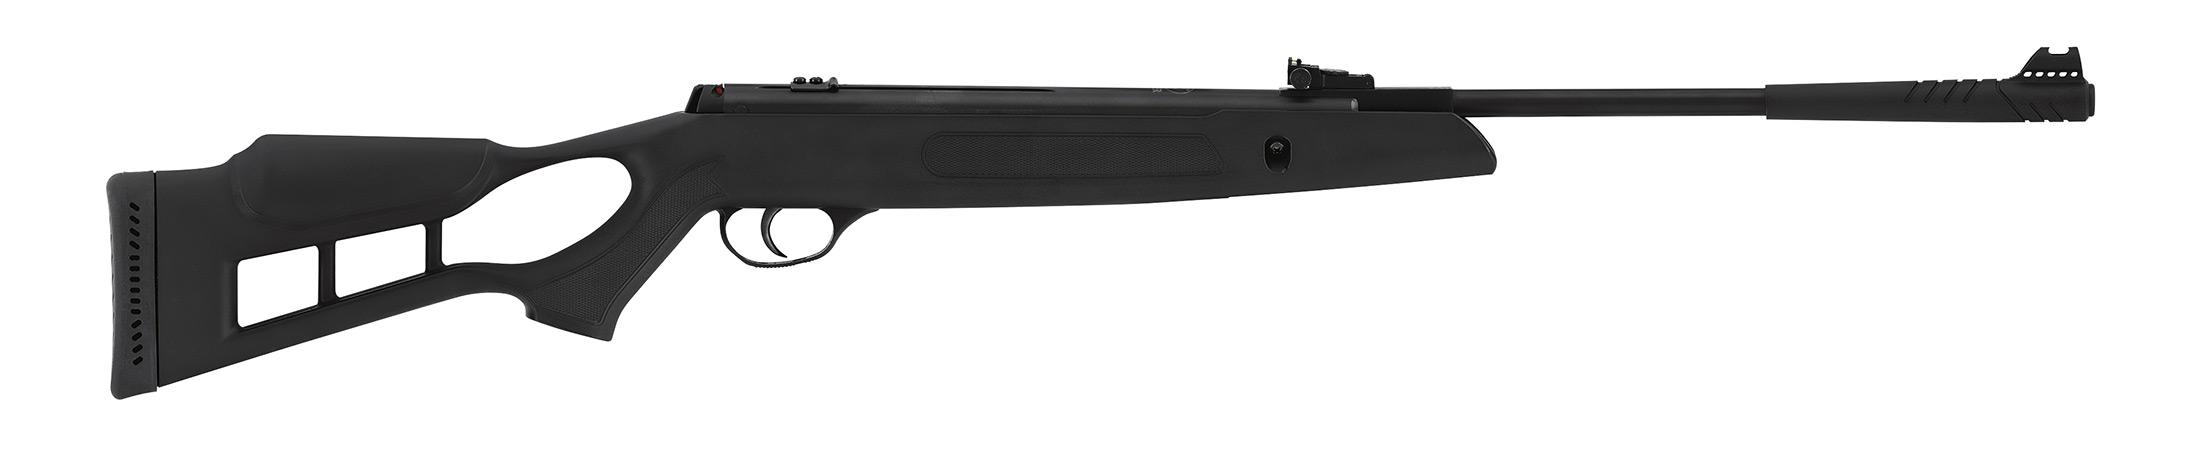 Hatsan Striker Edge TH 45mm 10J